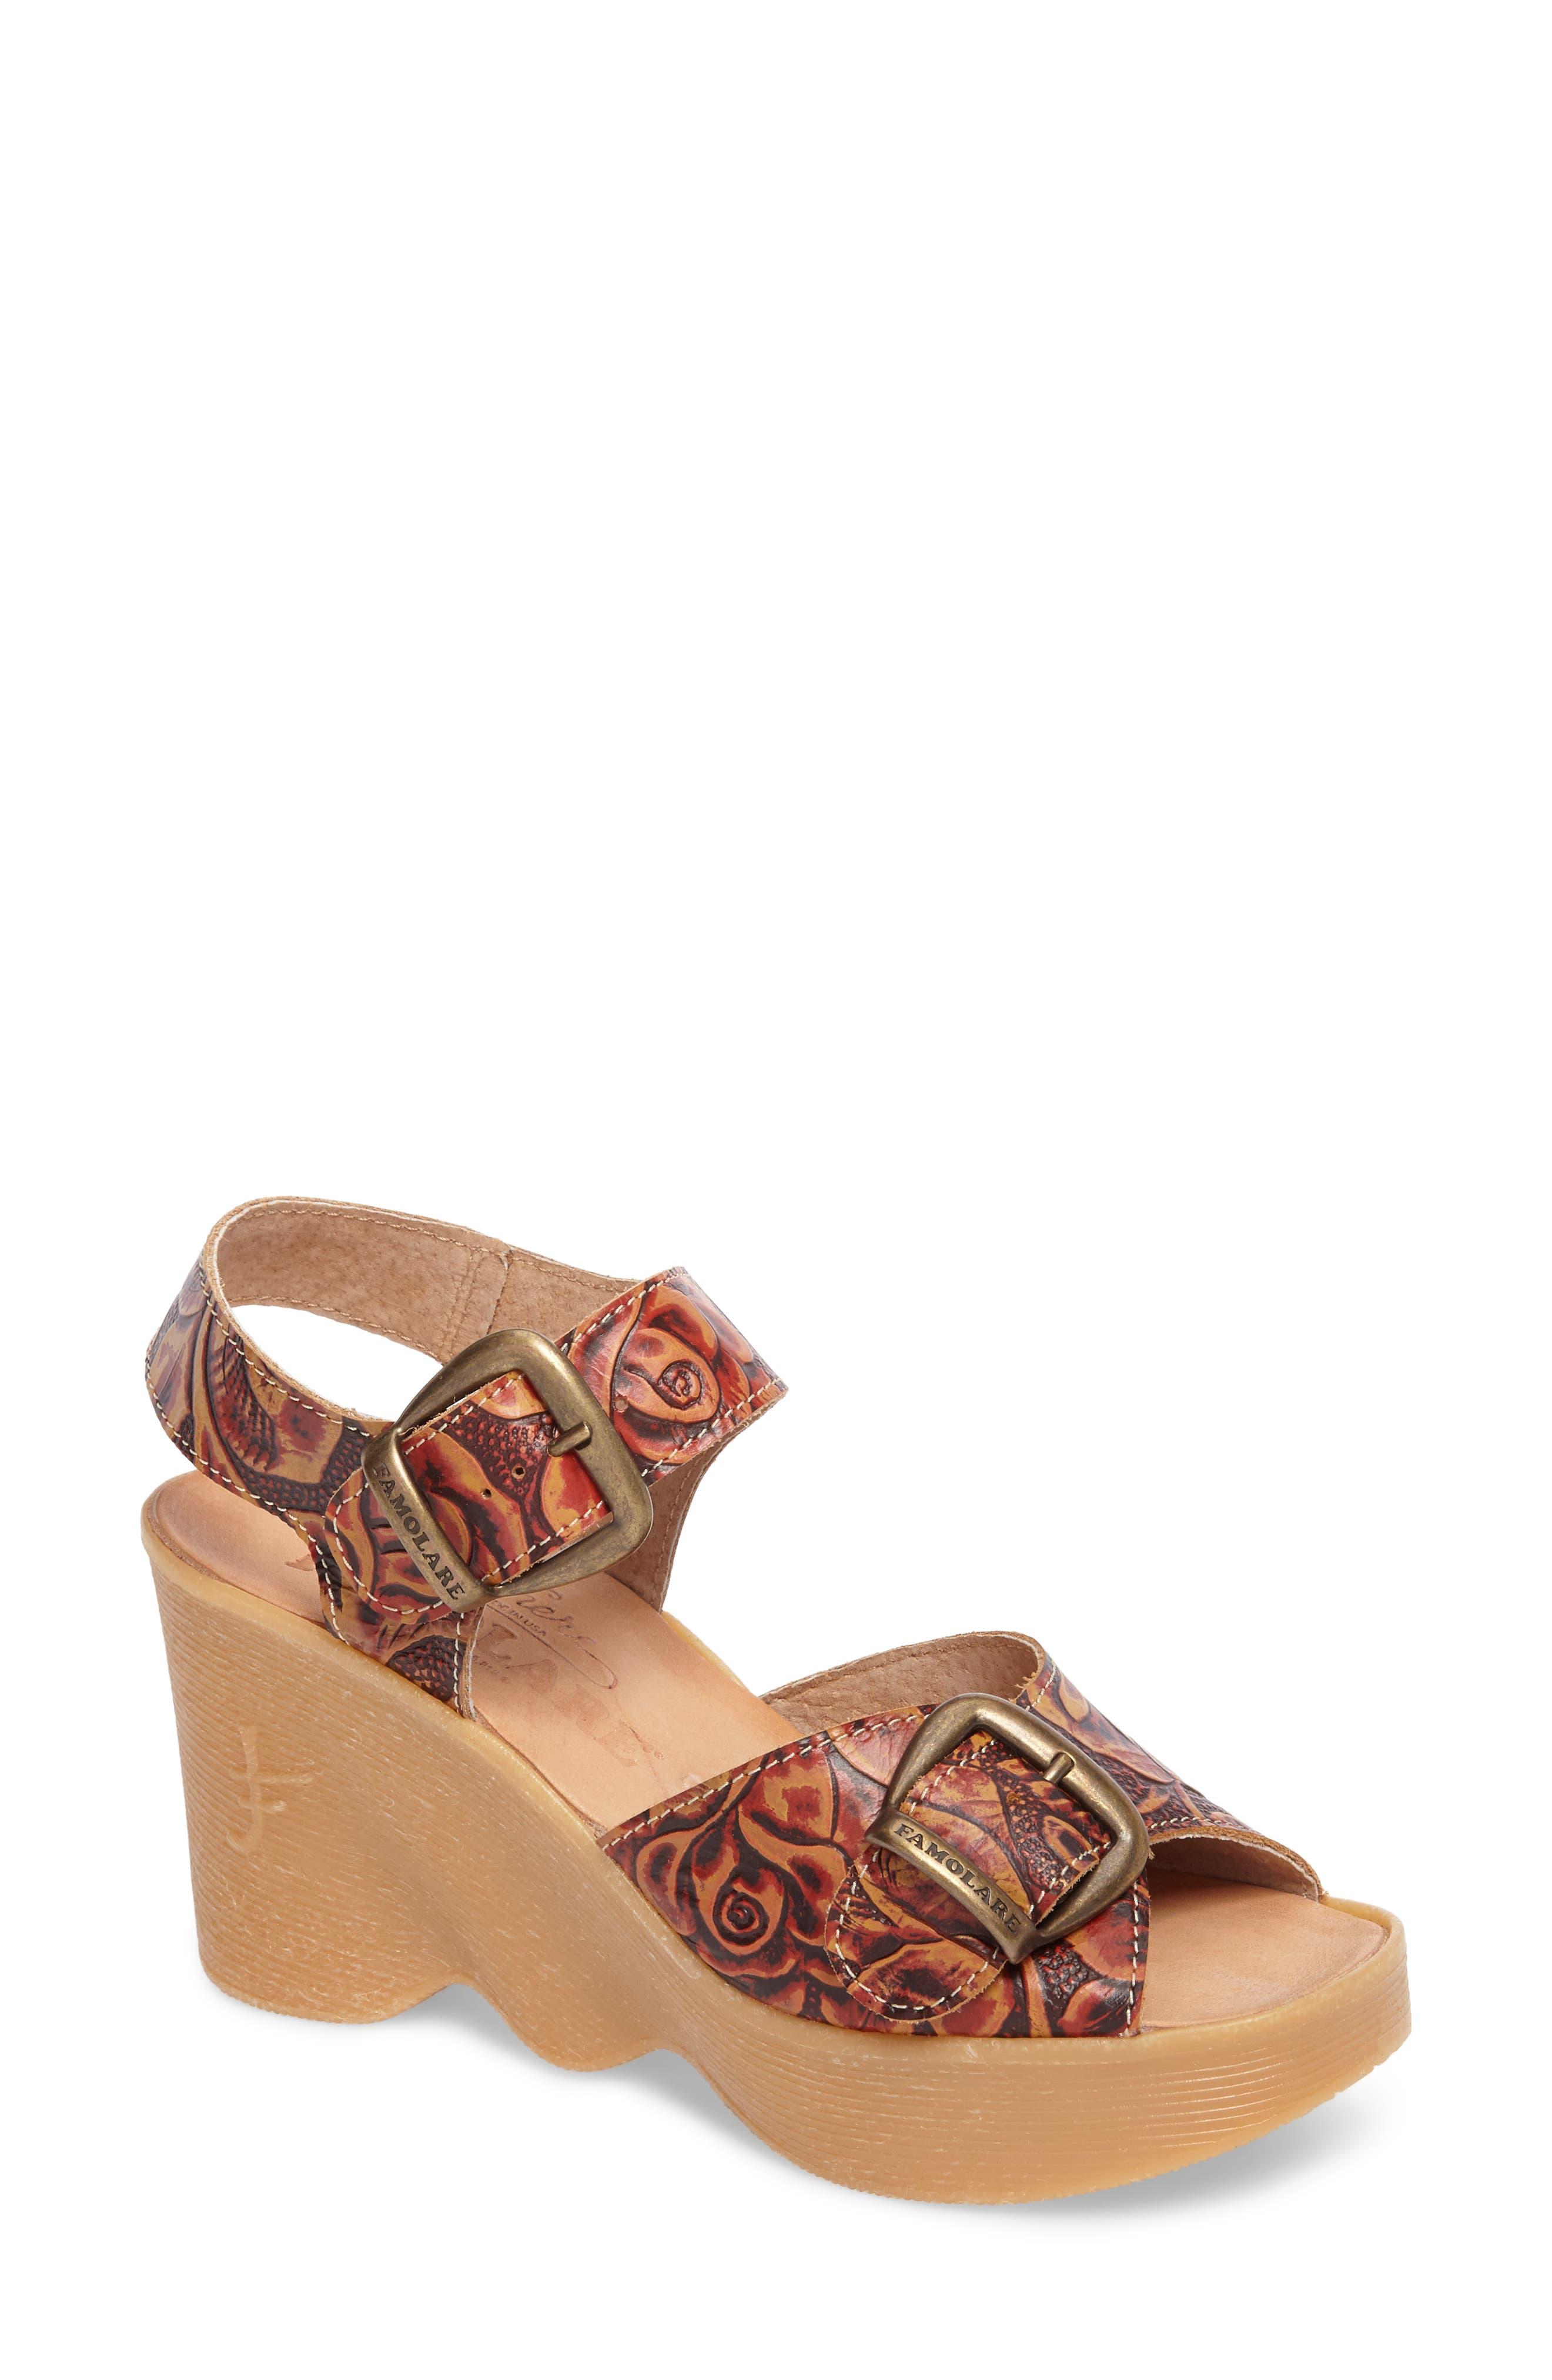 Main Image - Famolare Double Vision Wedge Sandal (Women)